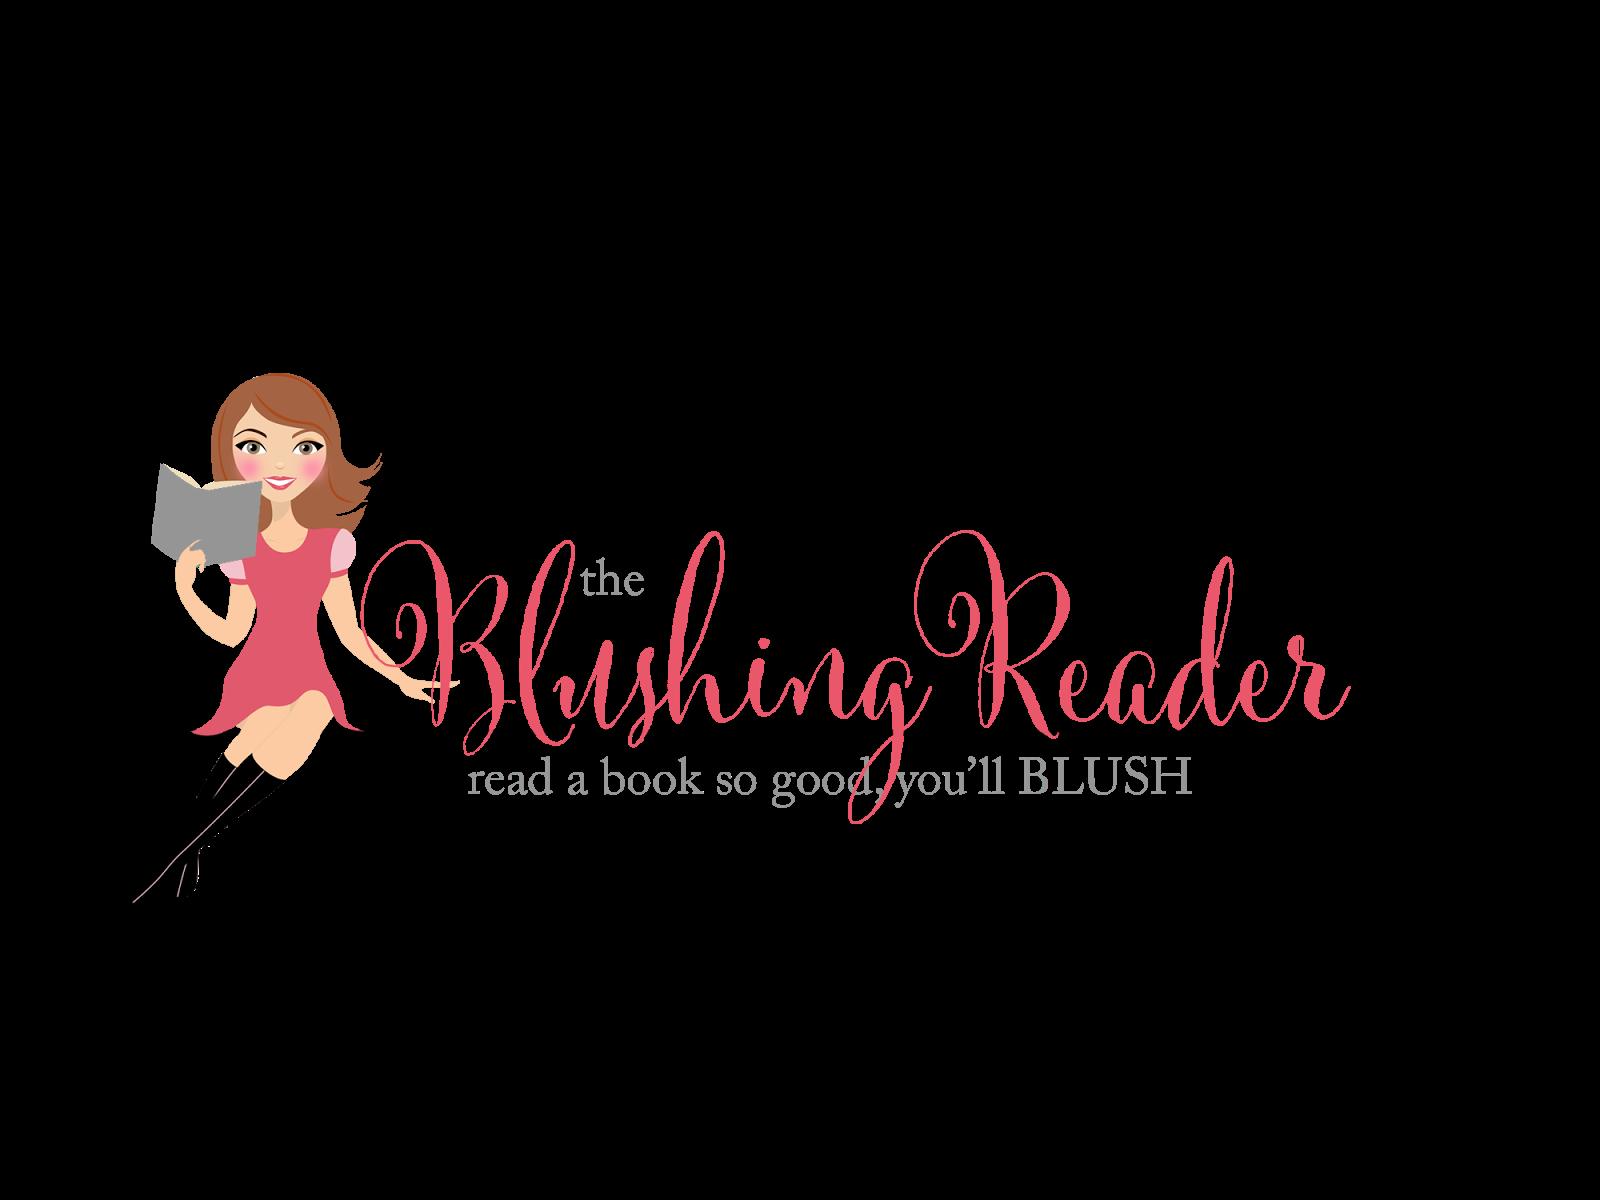 www.blushingreader.com